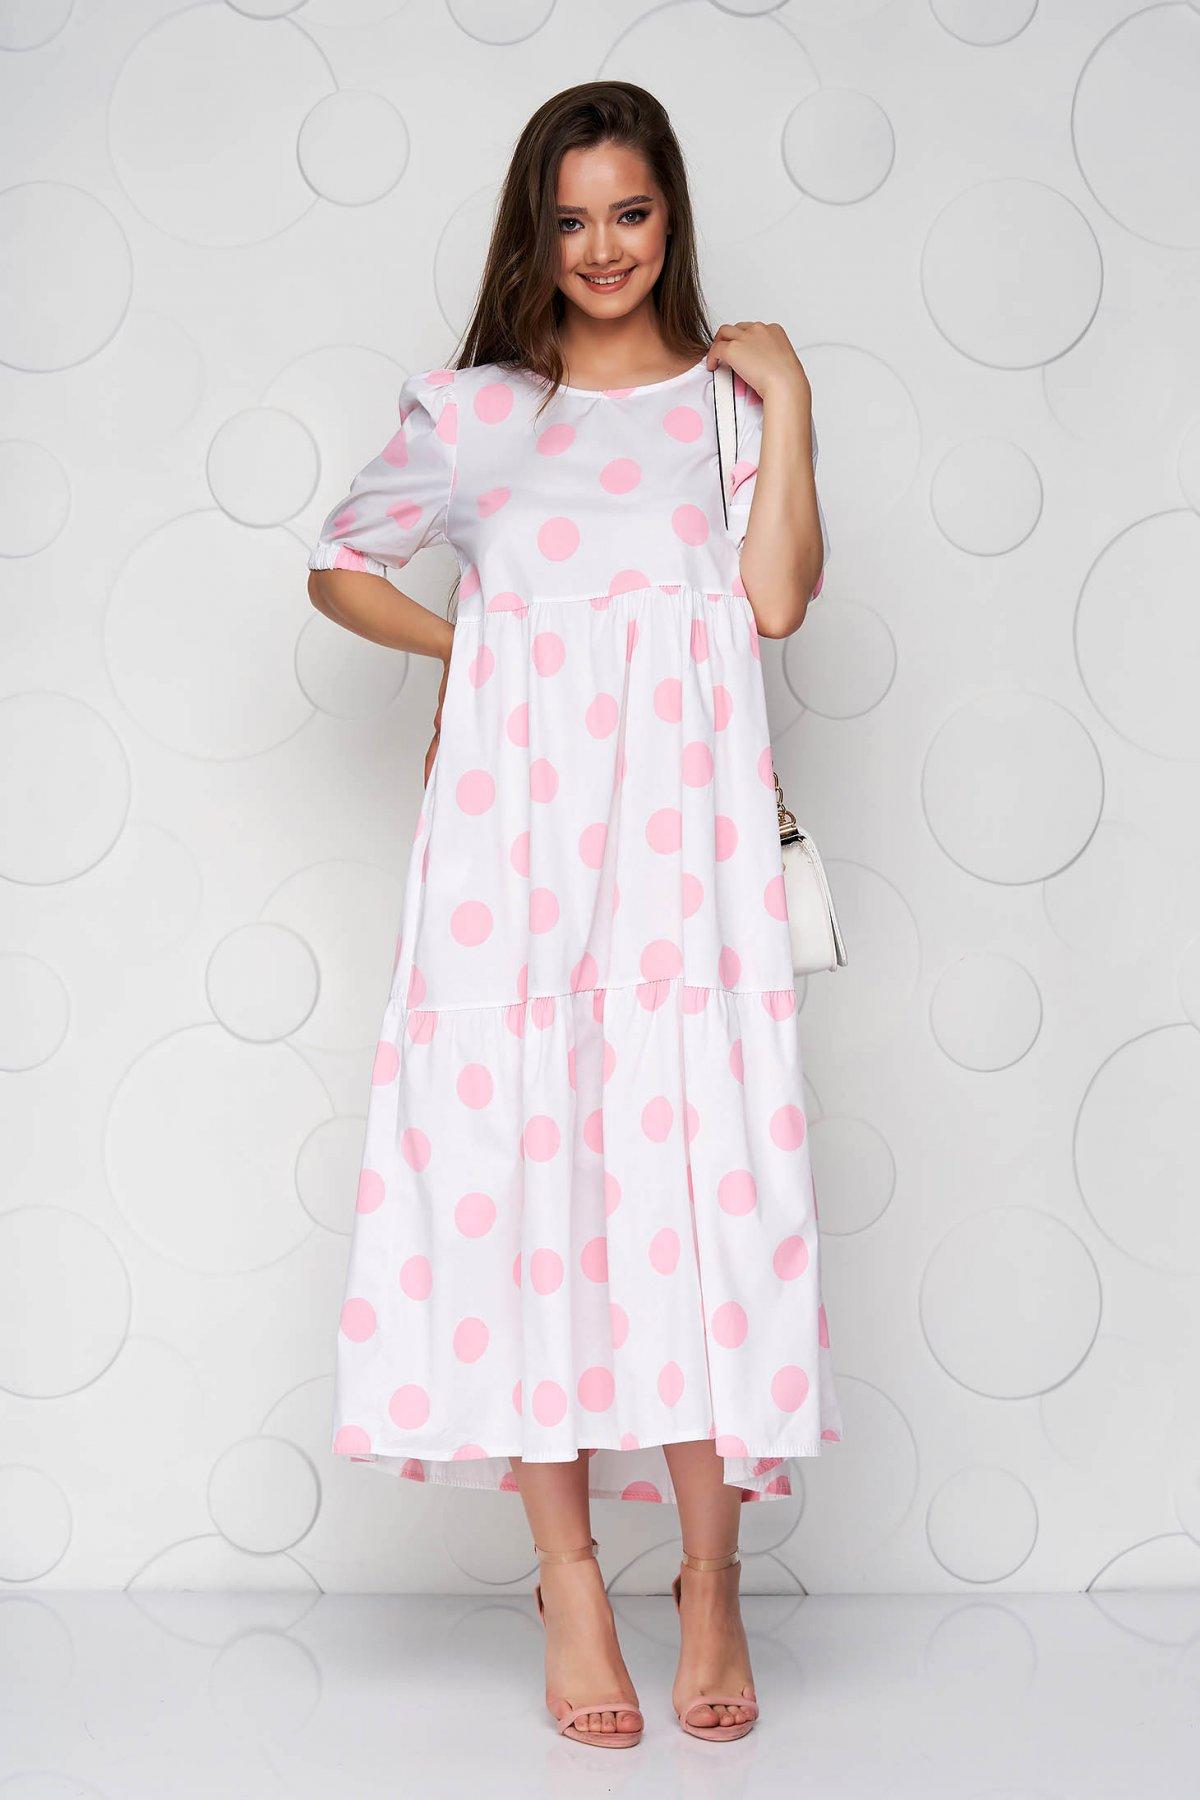 Rochie roz cu buline din material vaporos cu croi larg si volanase - medelin.ro